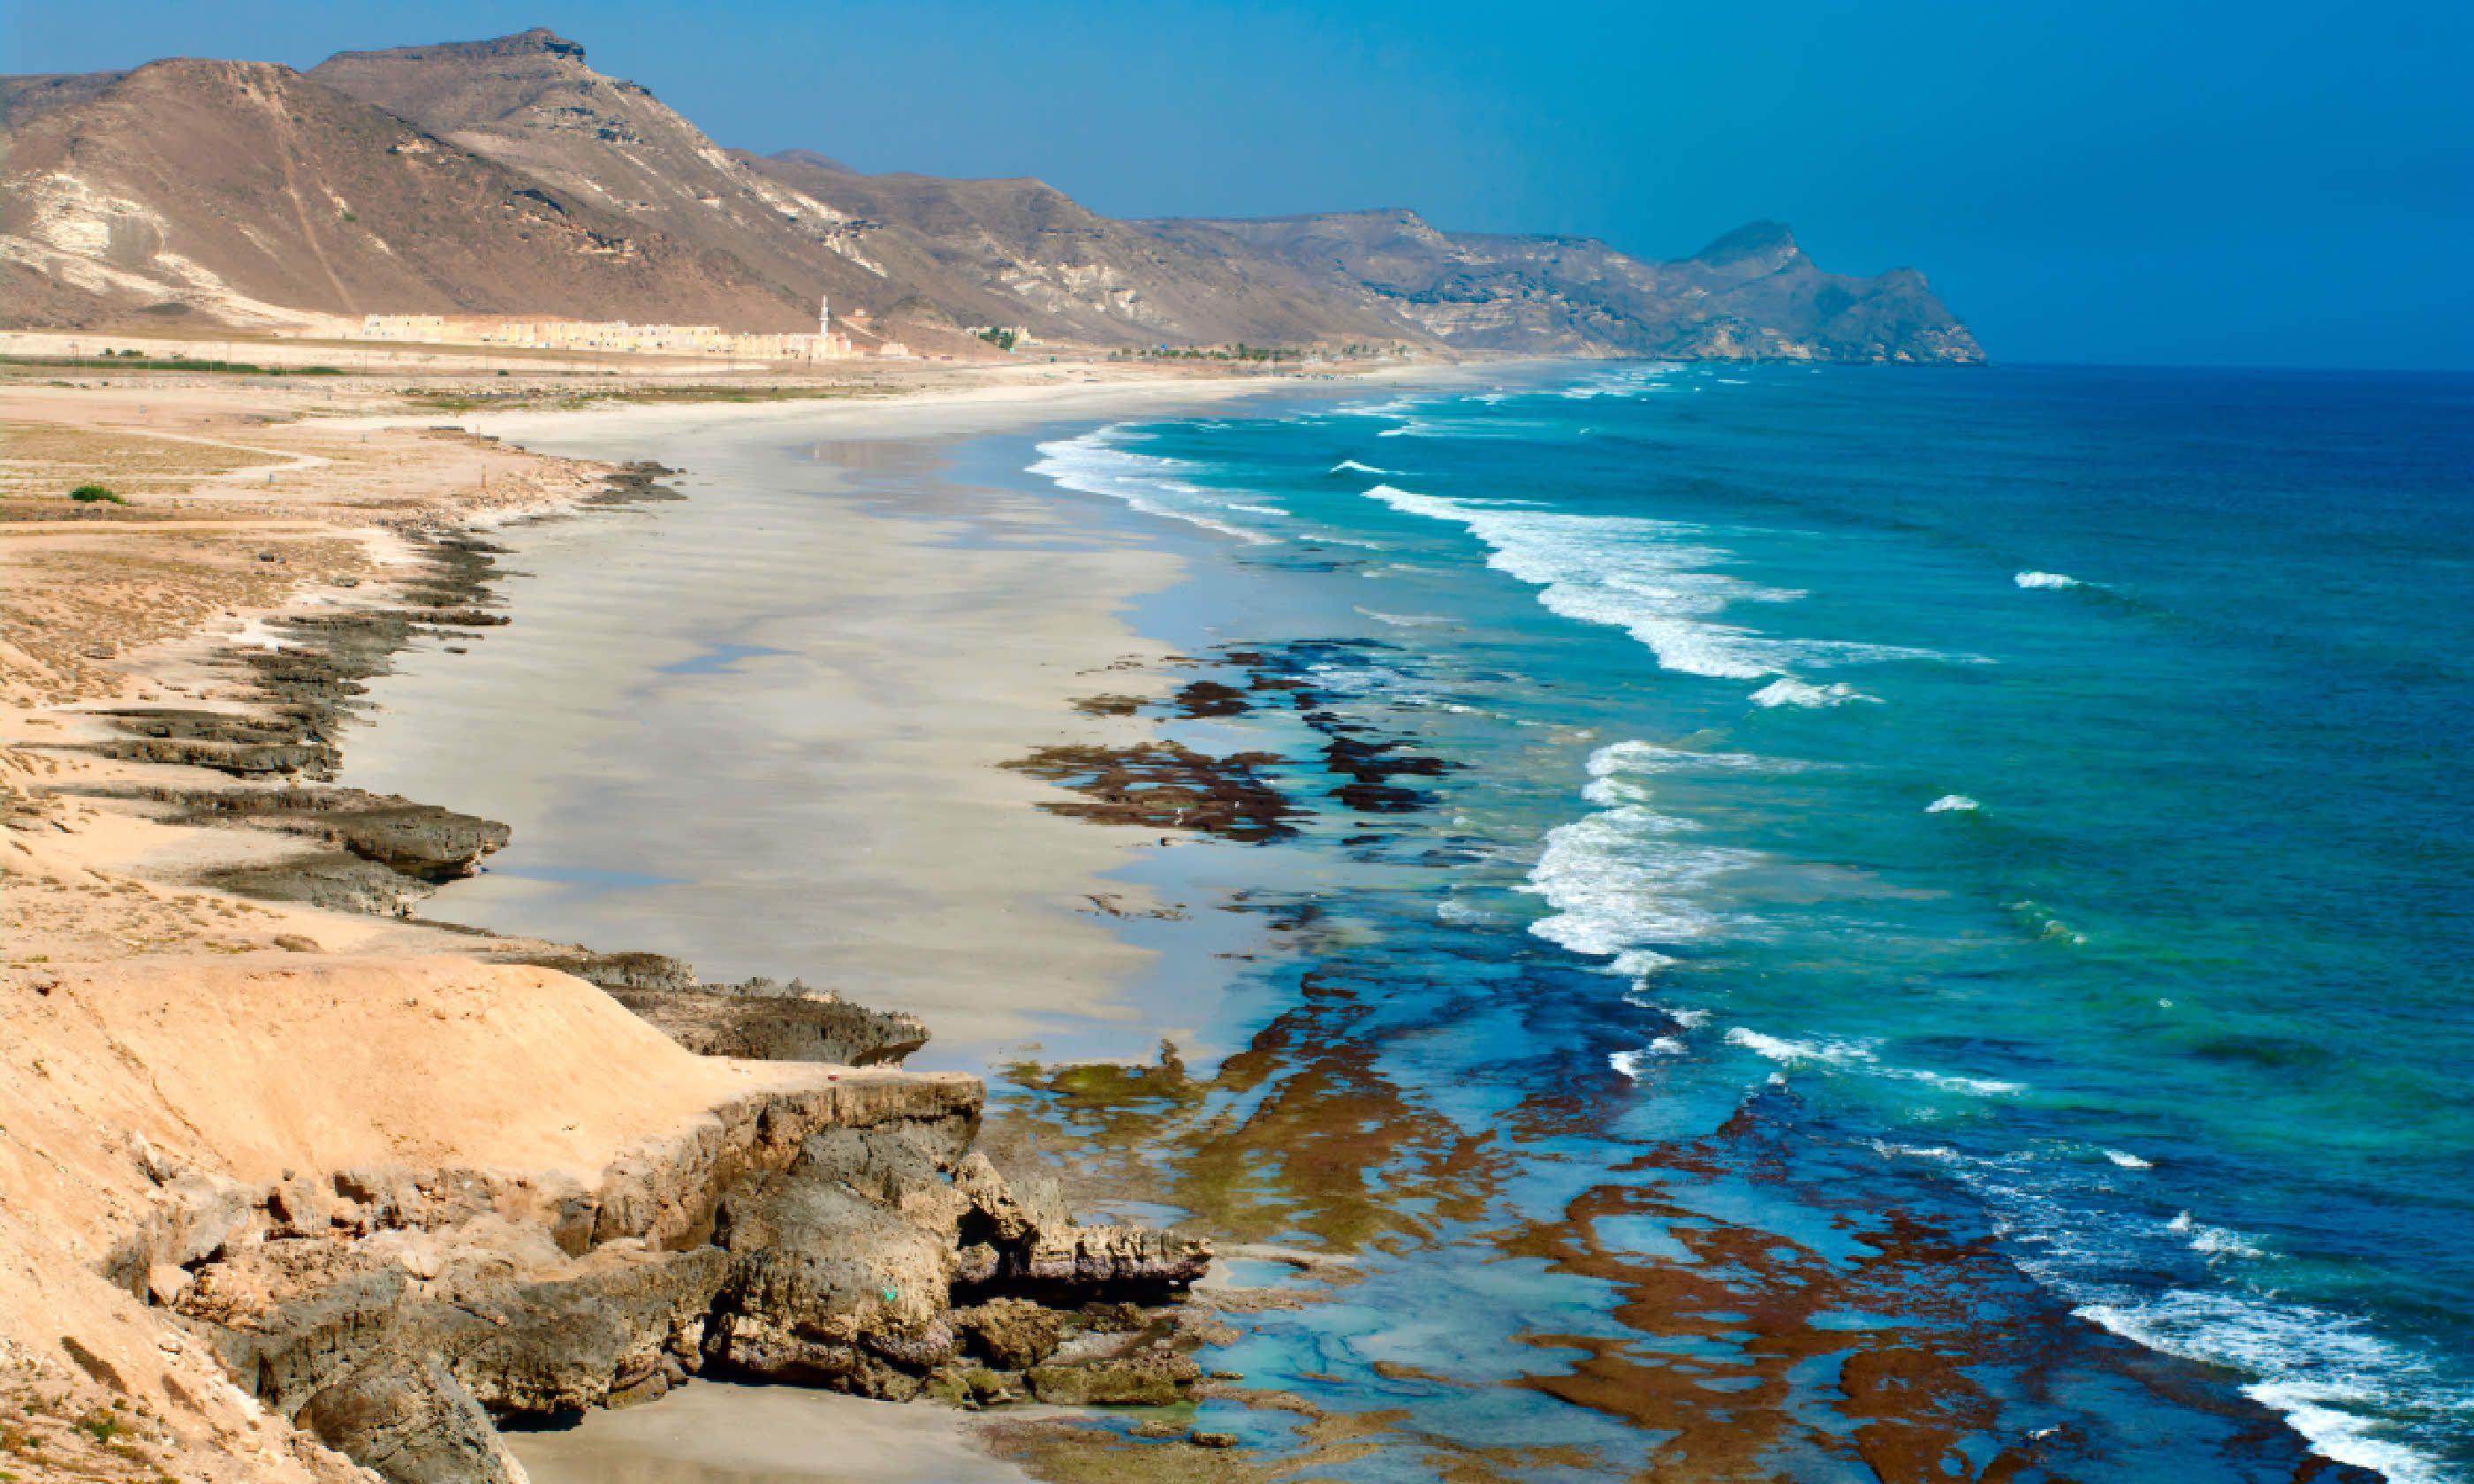 Al Mughsayl, Salalah, Oman (Shutterstock)